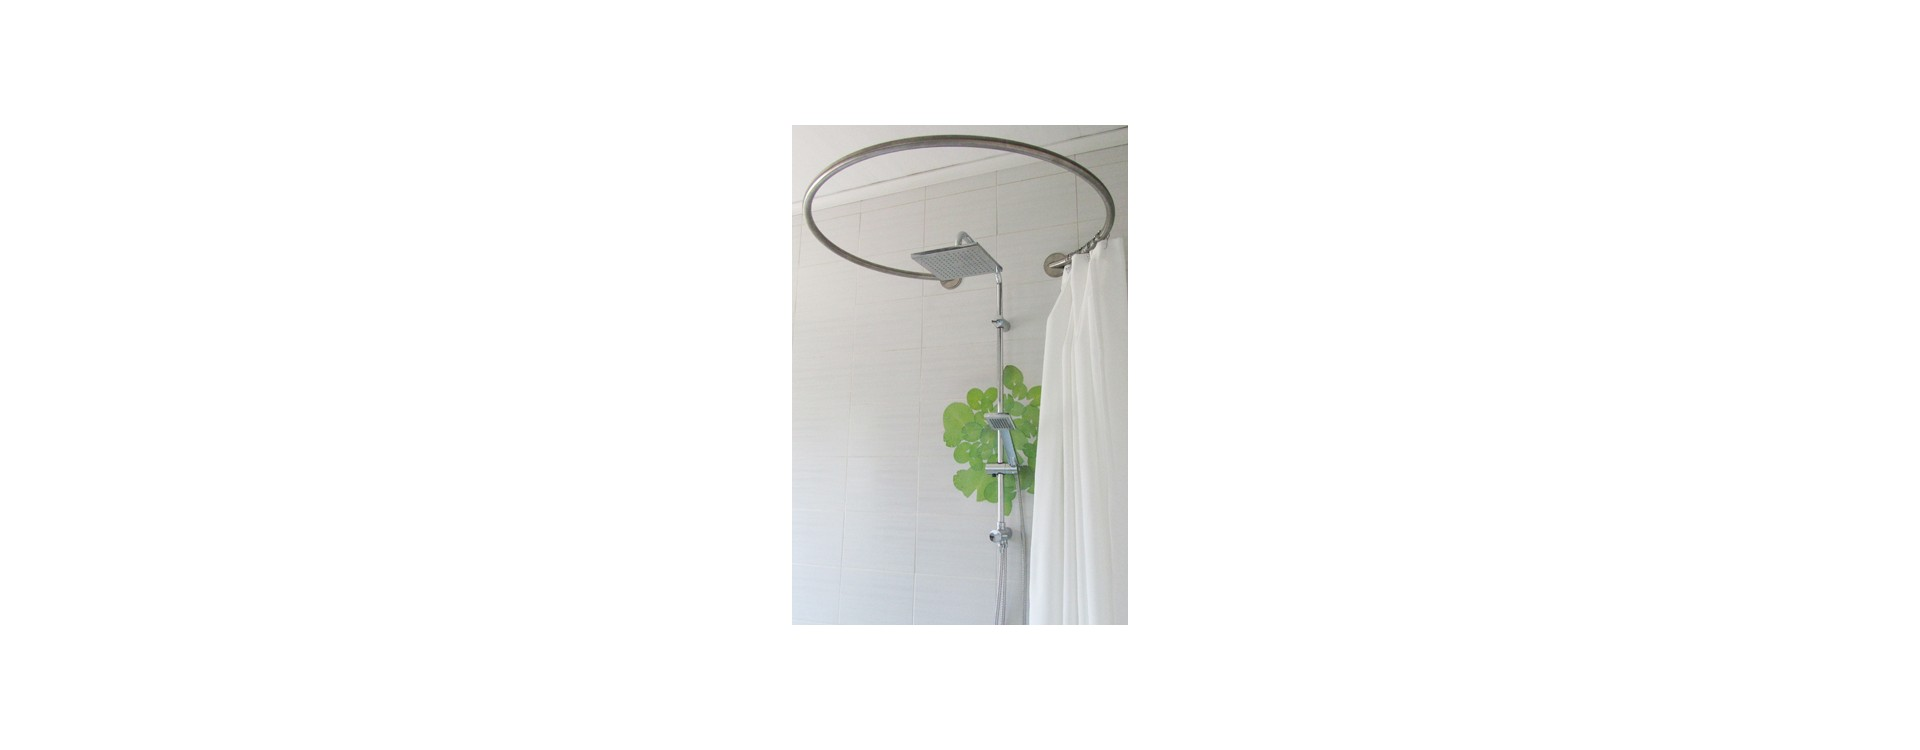 Paroi de douche textile circulaire GalboBain pour baignoire